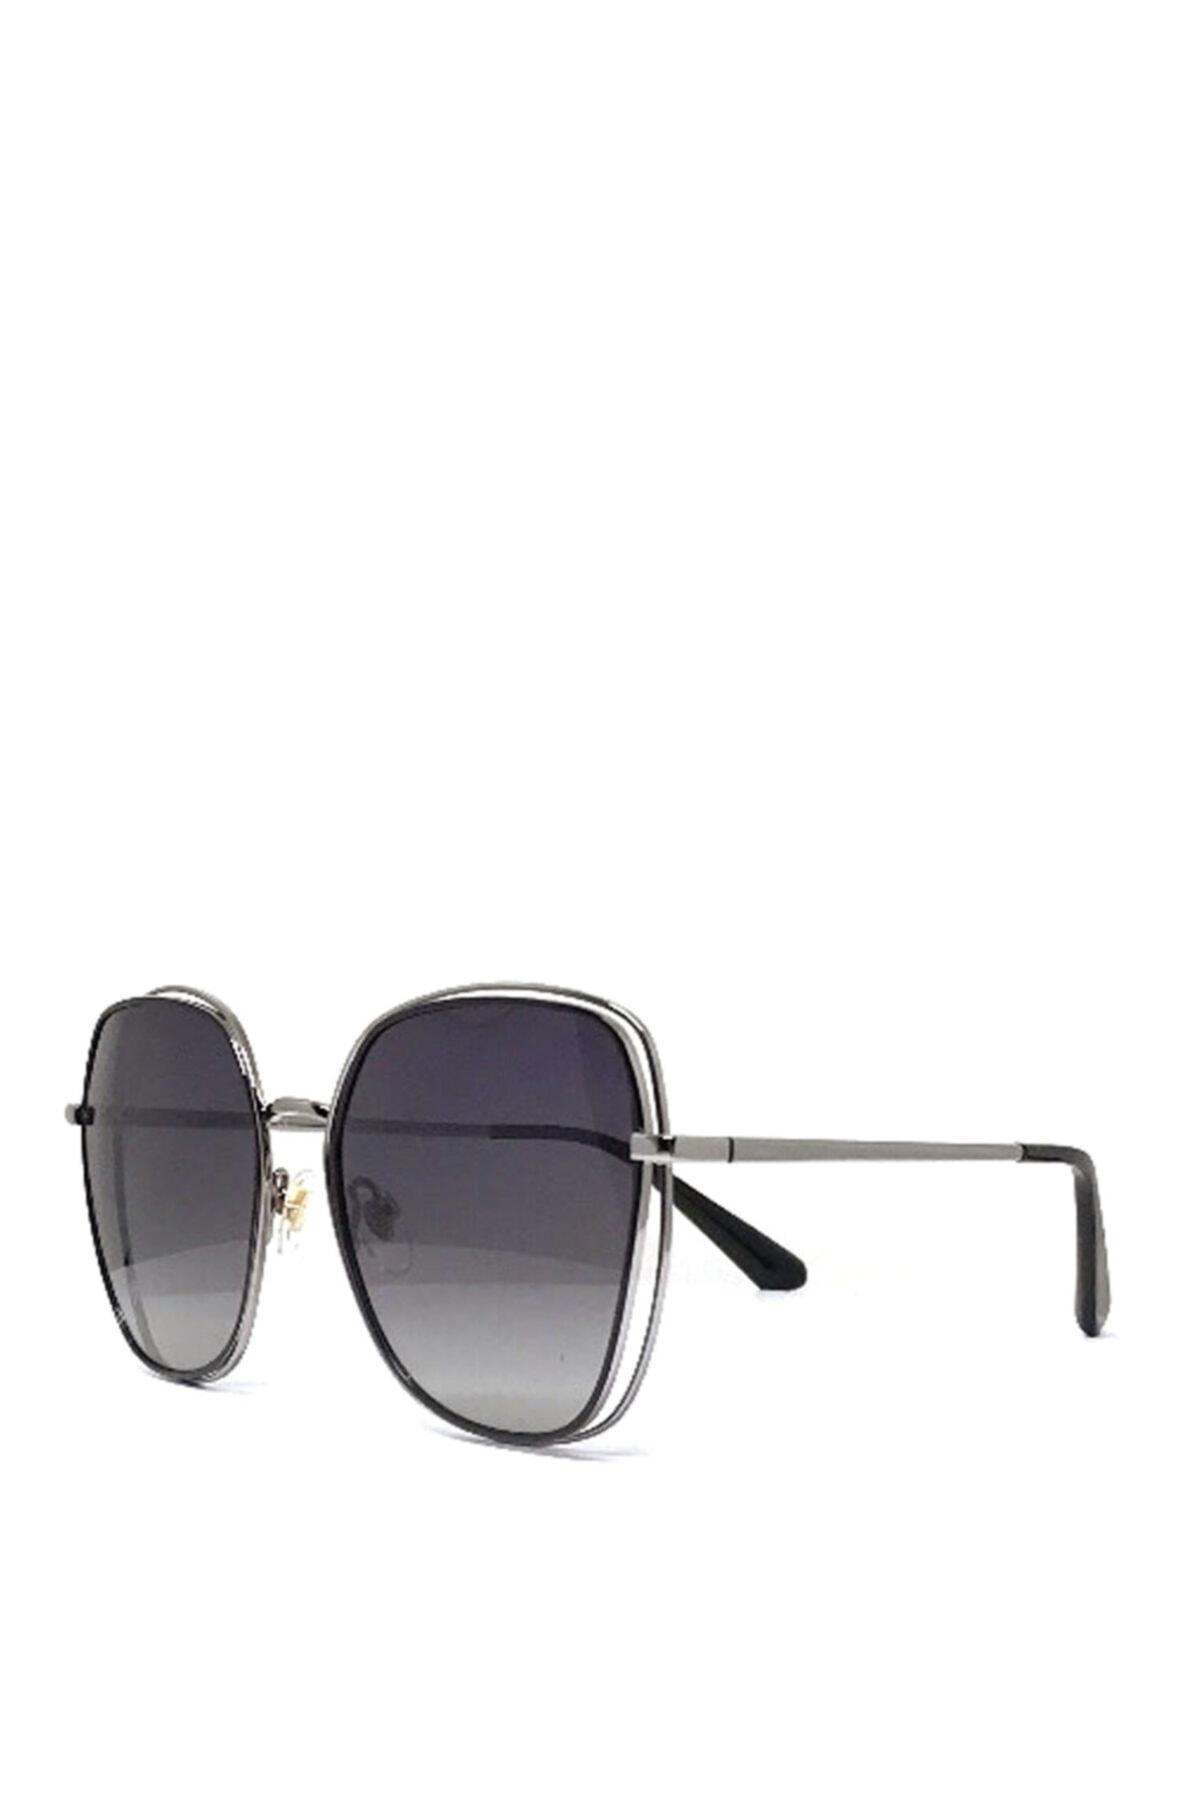 عینک آفتابی زنانه سال ۹۹ برند HAWK رنگ نقره کد ty55820821